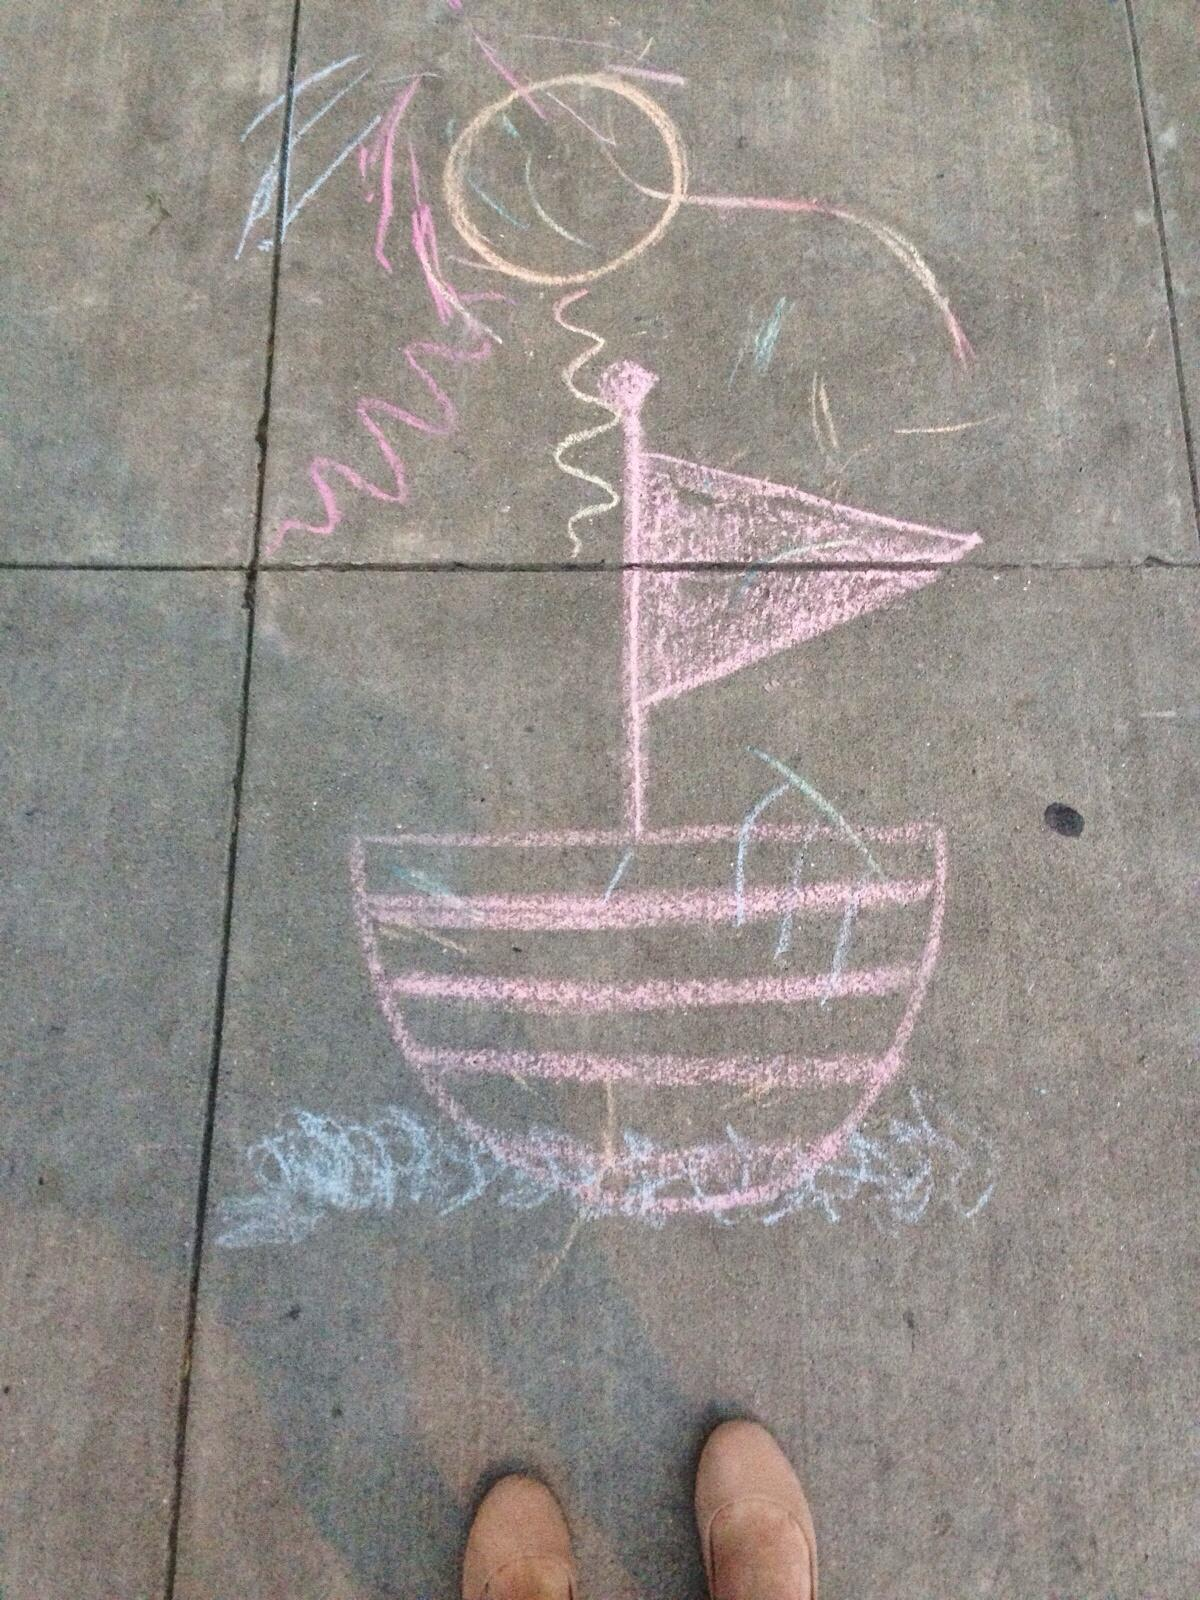 sidewalk art.jpg